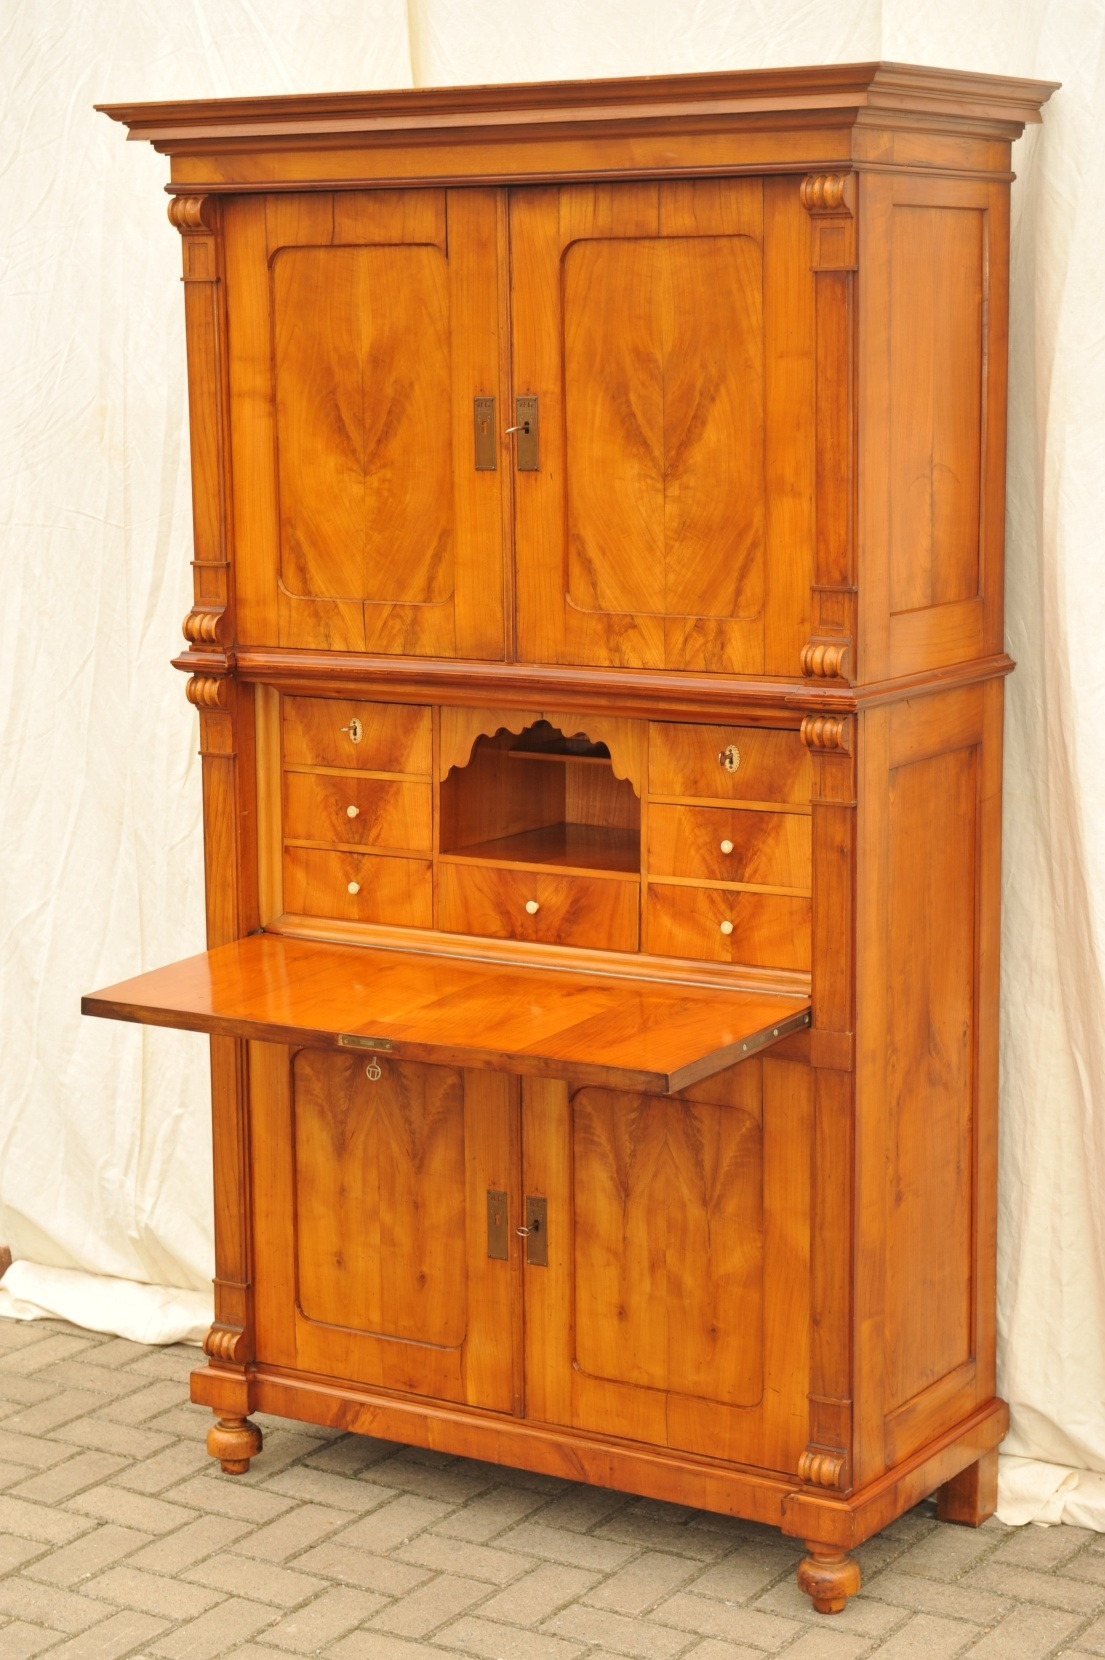 aufsatzsekret r kirsche antik antik im hof antiker sekret r kirsche kirschbaum sekret r. Black Bedroom Furniture Sets. Home Design Ideas